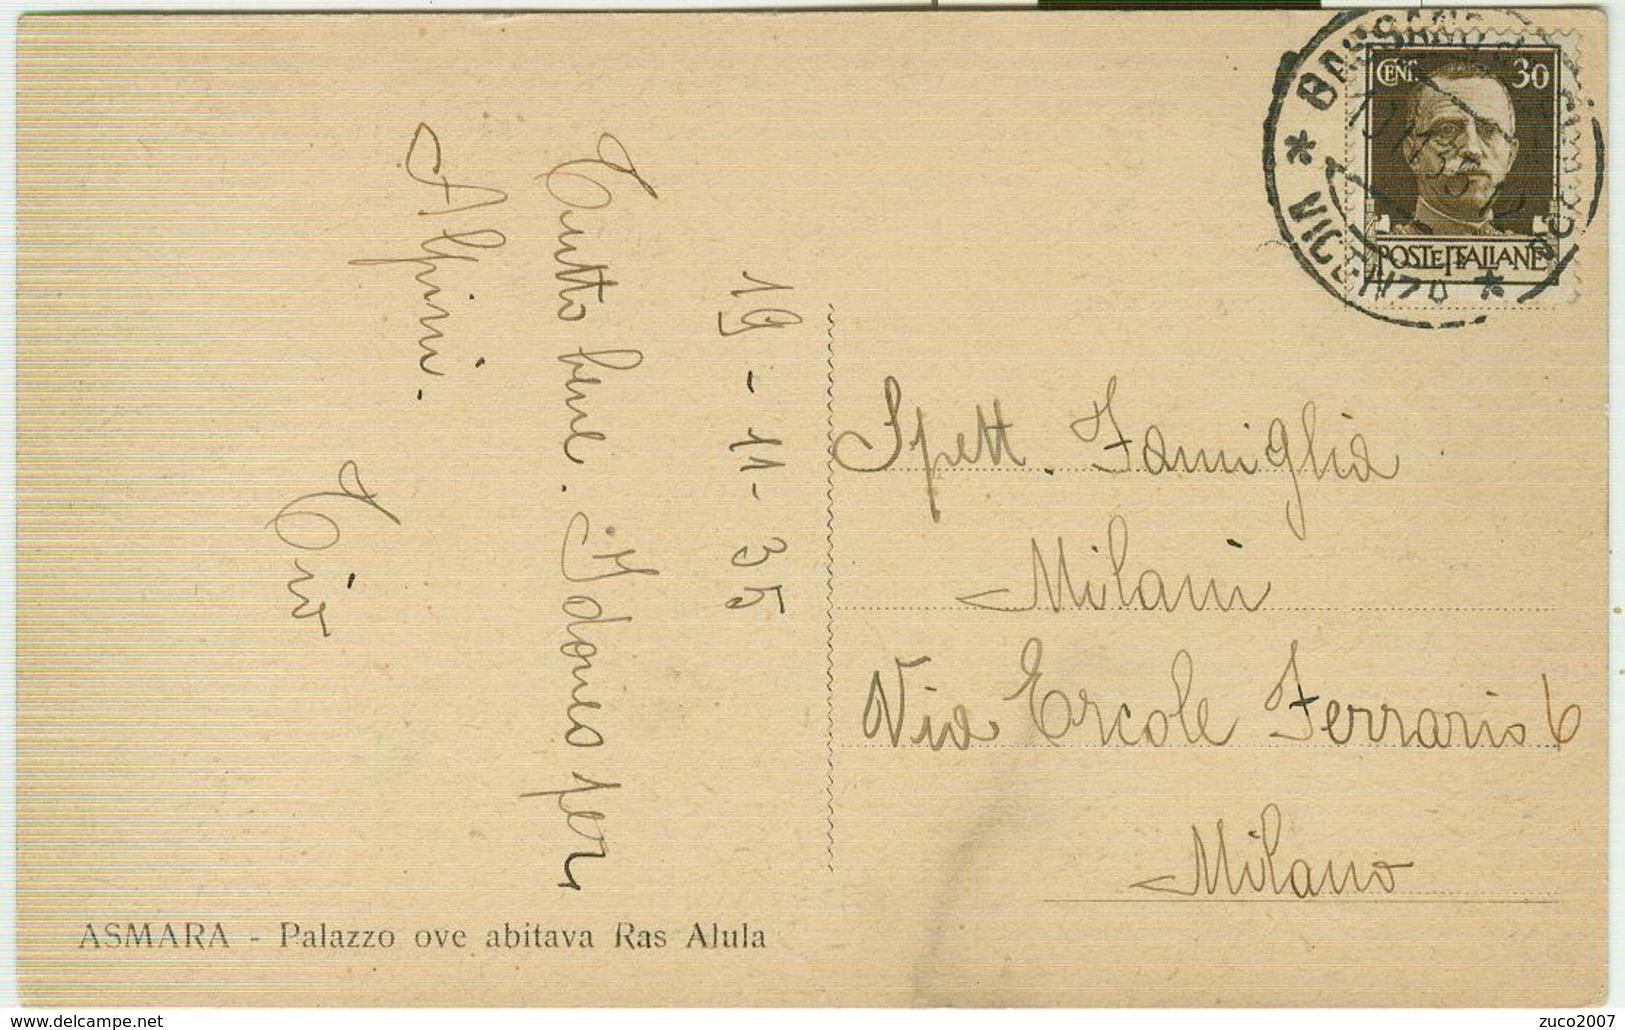 ASMARA(ERITREA), PALAZZO OVE ABITAVA RAS ALULA,B/N,VIAGGIATA,1935, - Eritrea